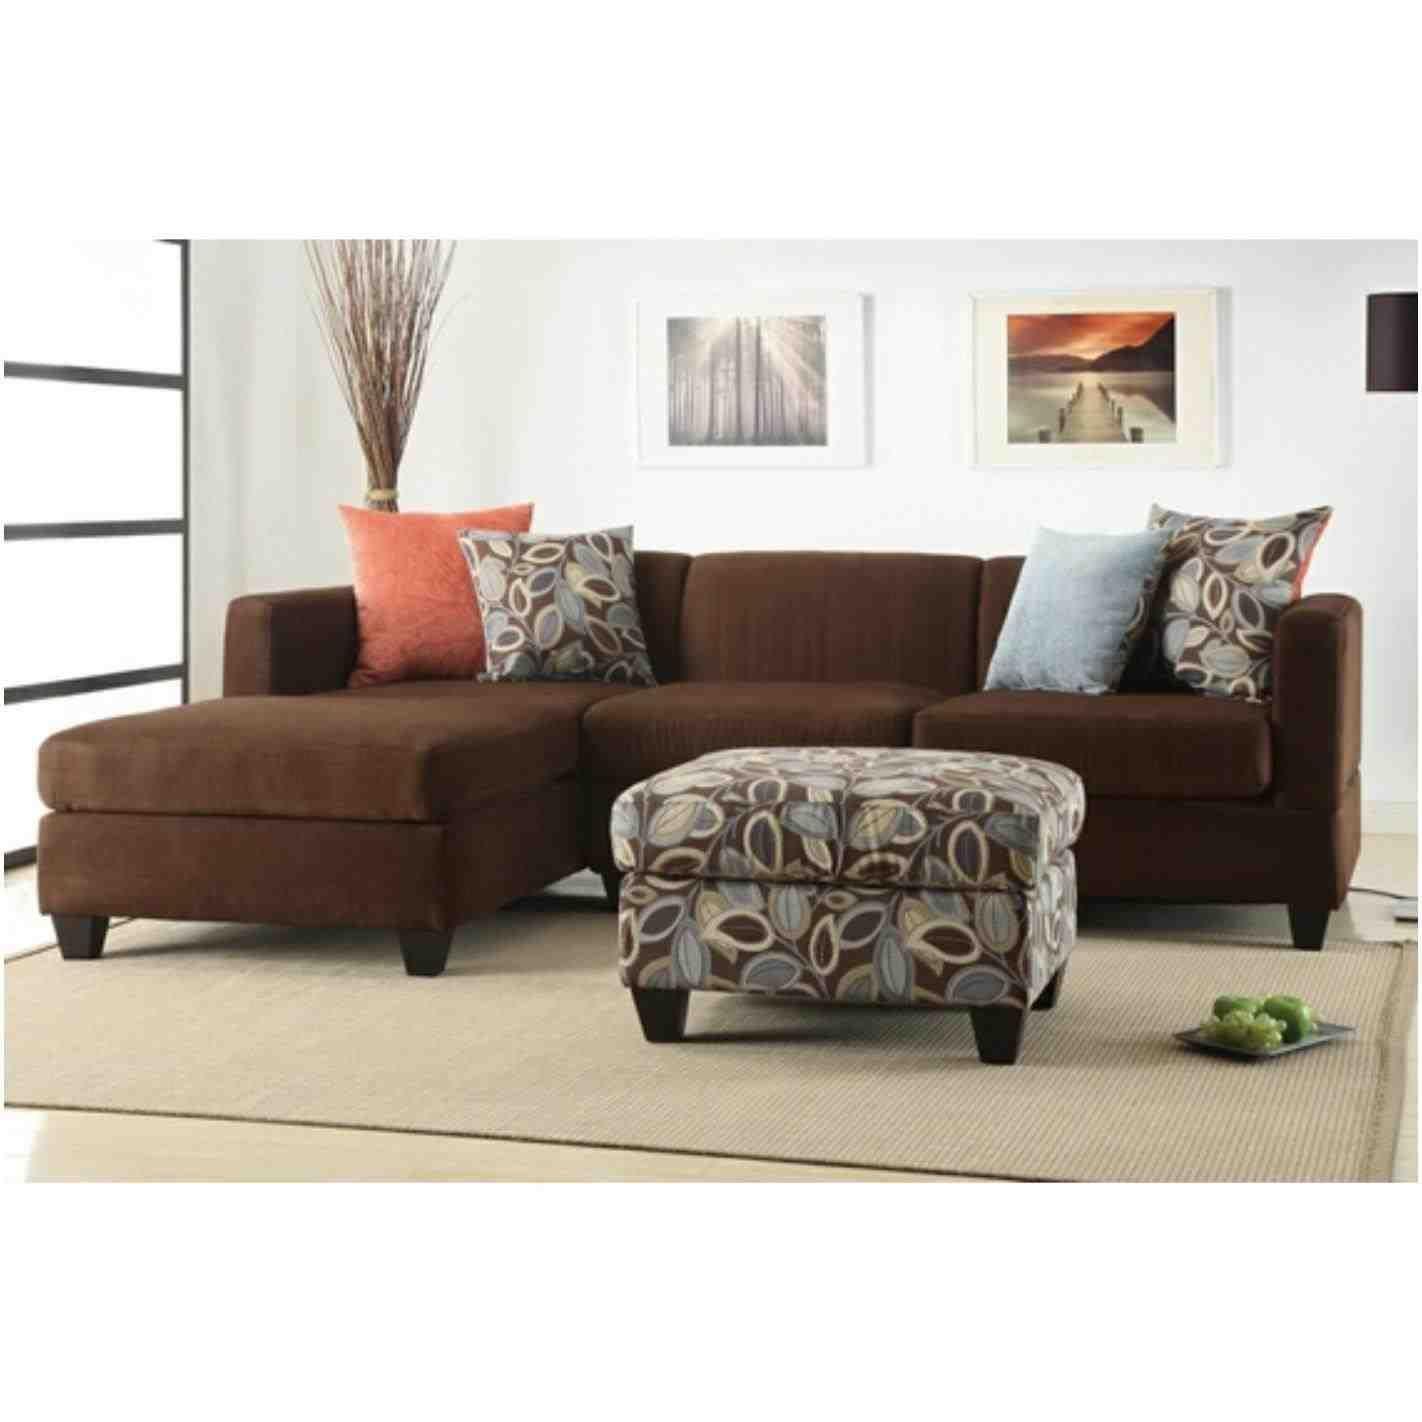 Cheap Sofa Edmonton Full Size Of Furniture Used Furniture Stores Terre Haute Used Furniture Stores Jackson Tn Furniture Decoracao Da Sala Casas Decoracao